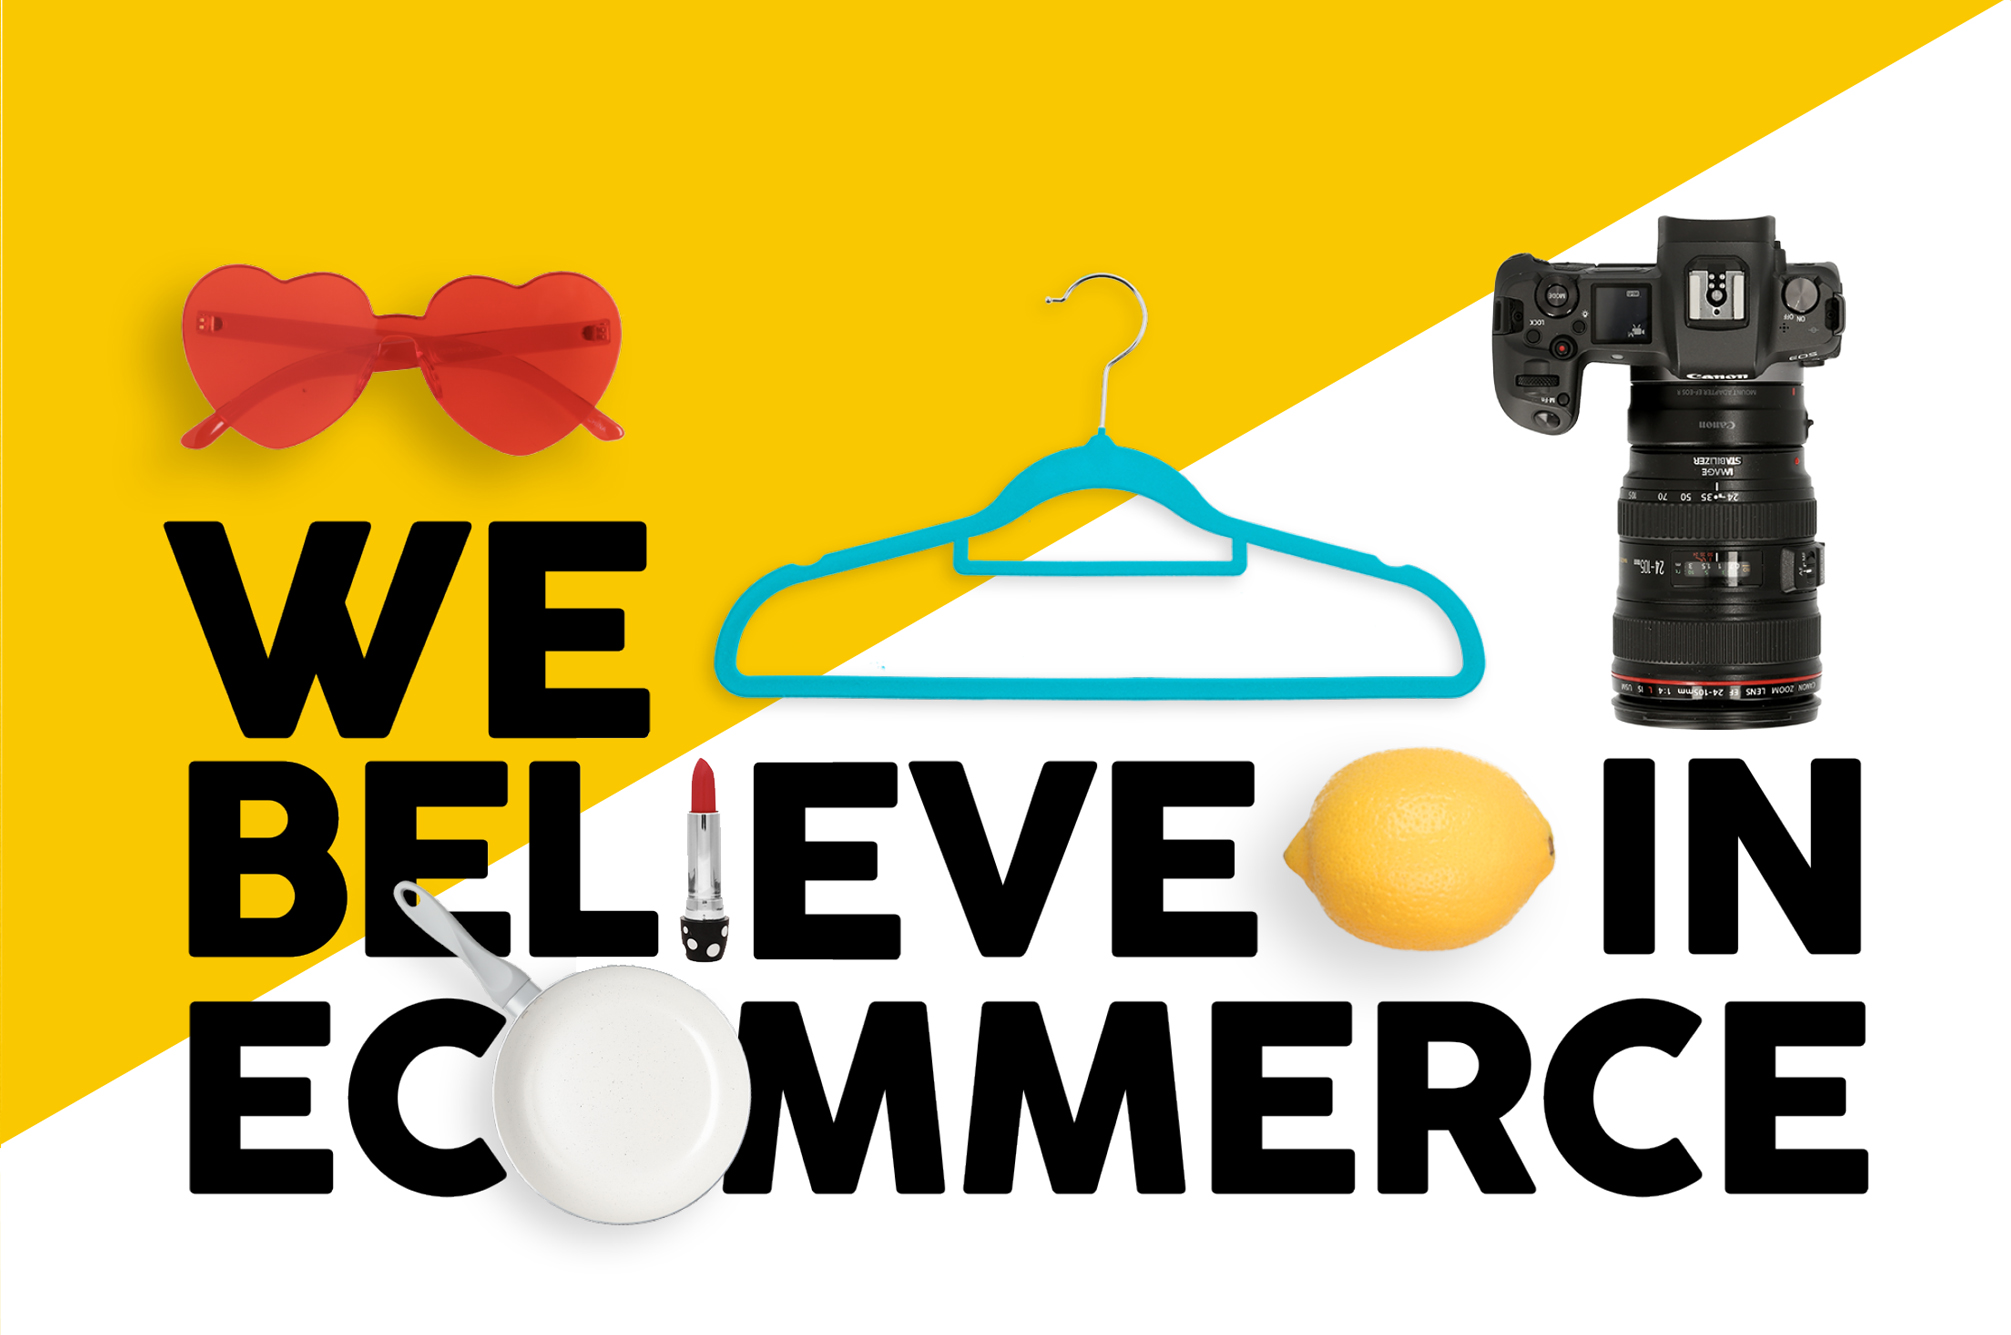 Hero FullFrame We Believe in eCommerce